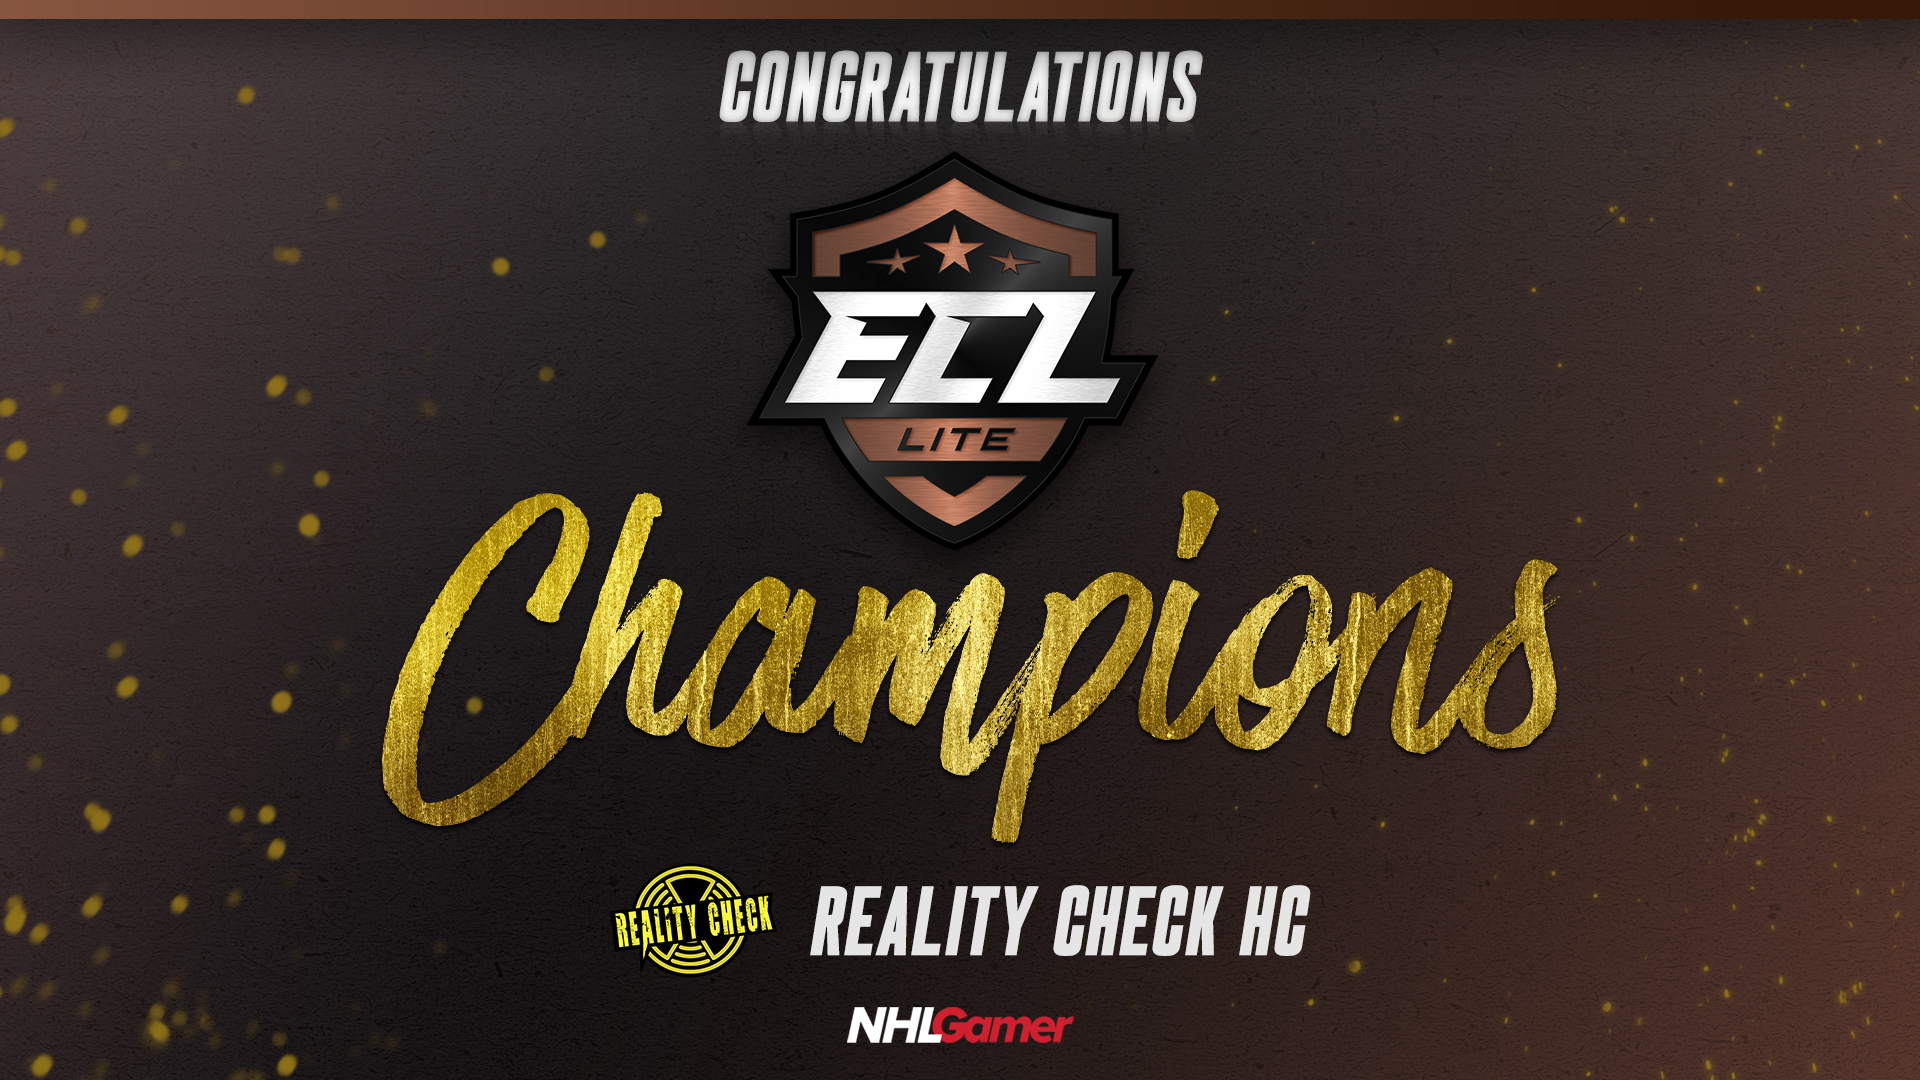 ECL_12_Lite_Champions_Reality_Check_HC.j